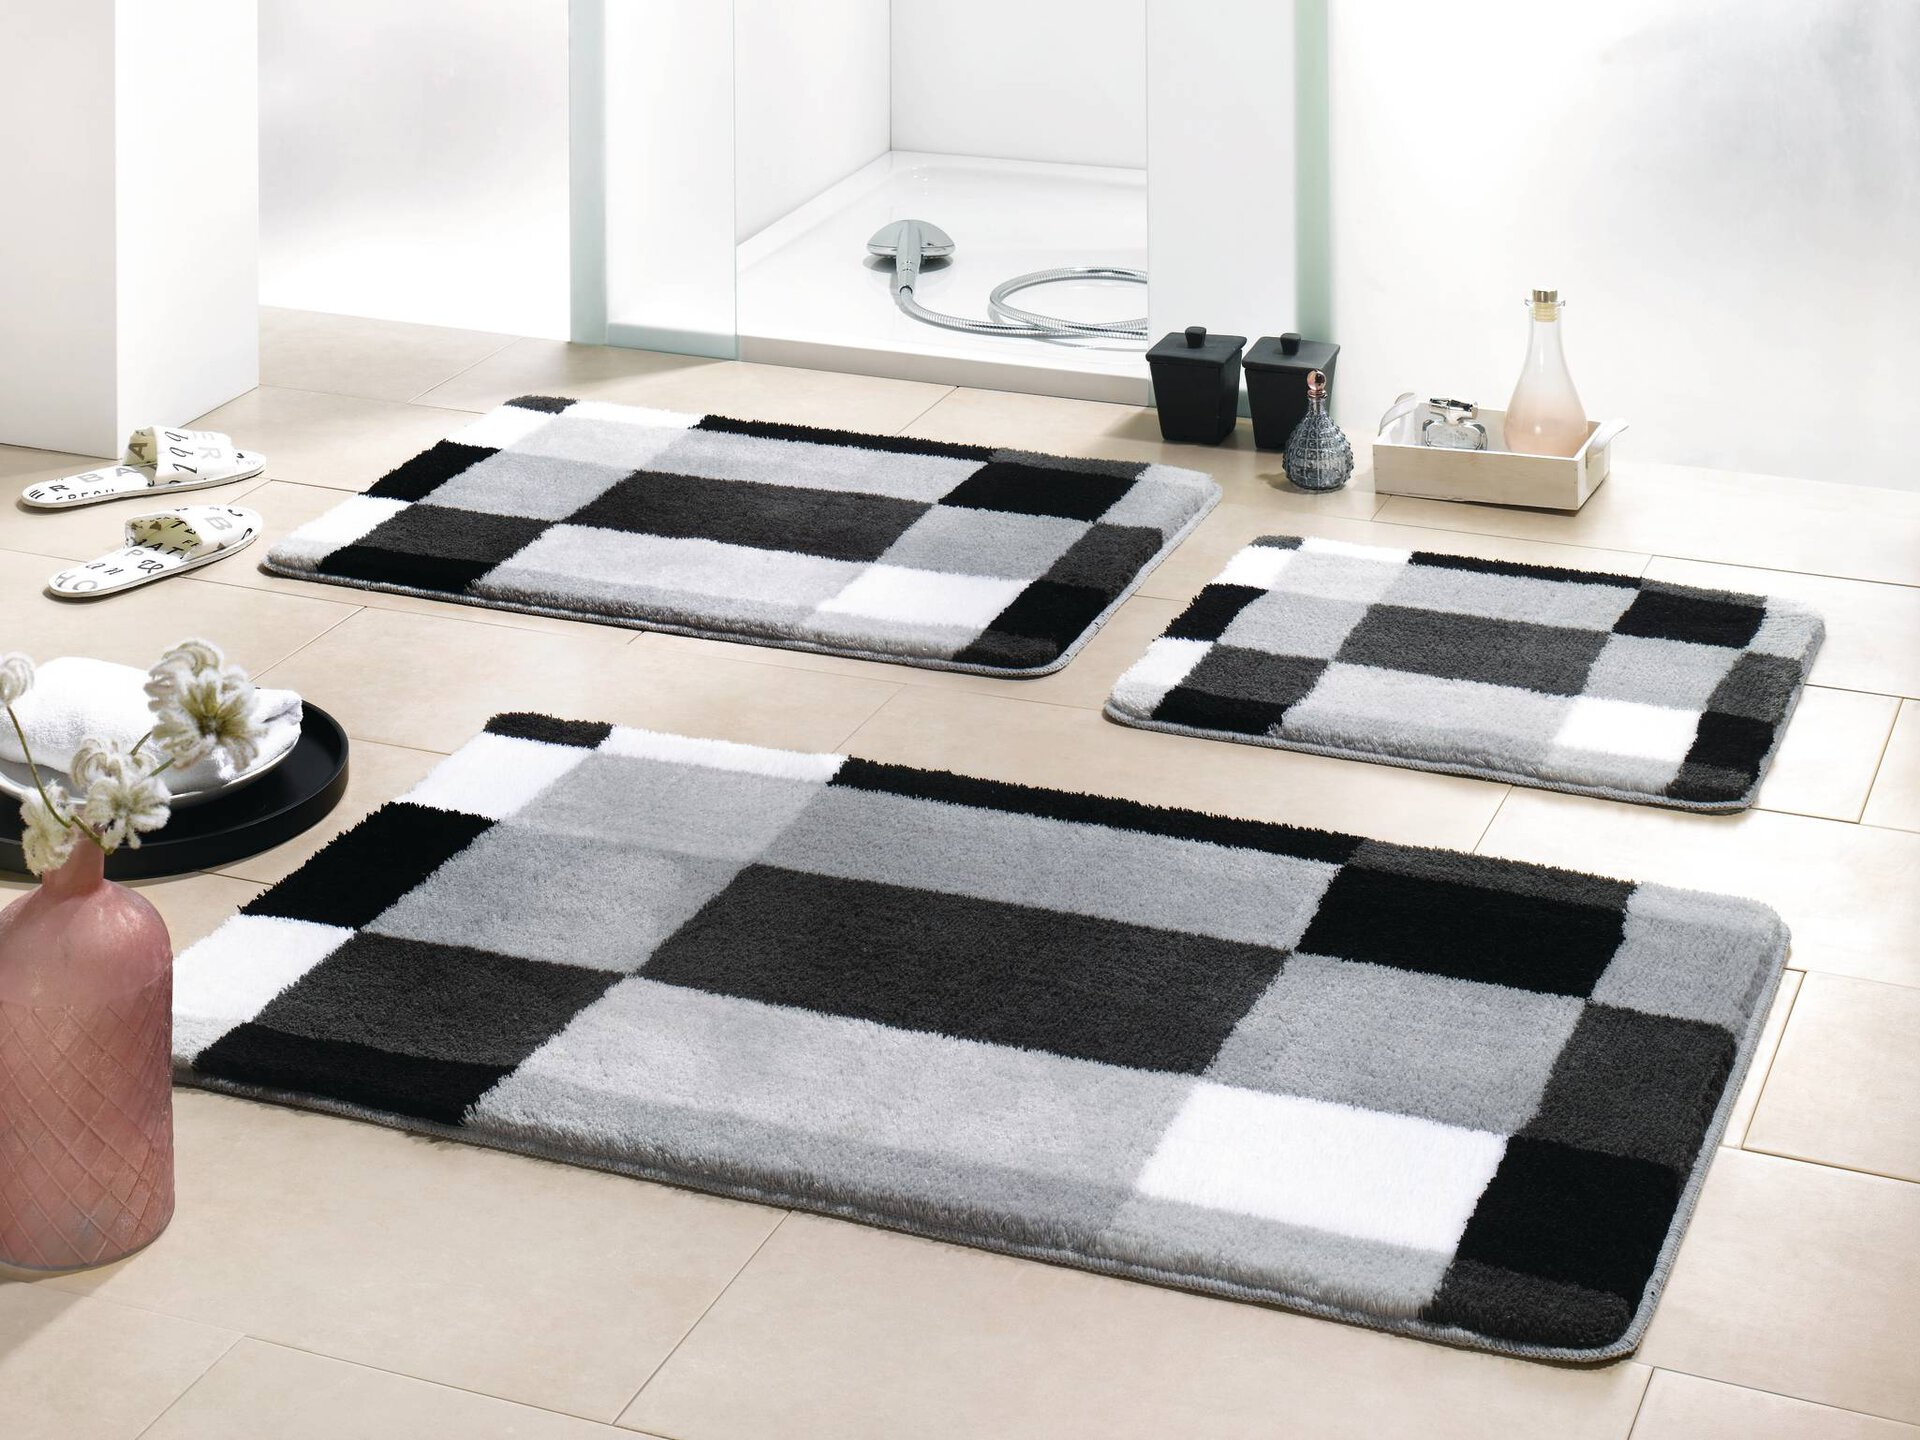 Badteppich Edge Kleine Wolke Textil grau 50 x 60 cm